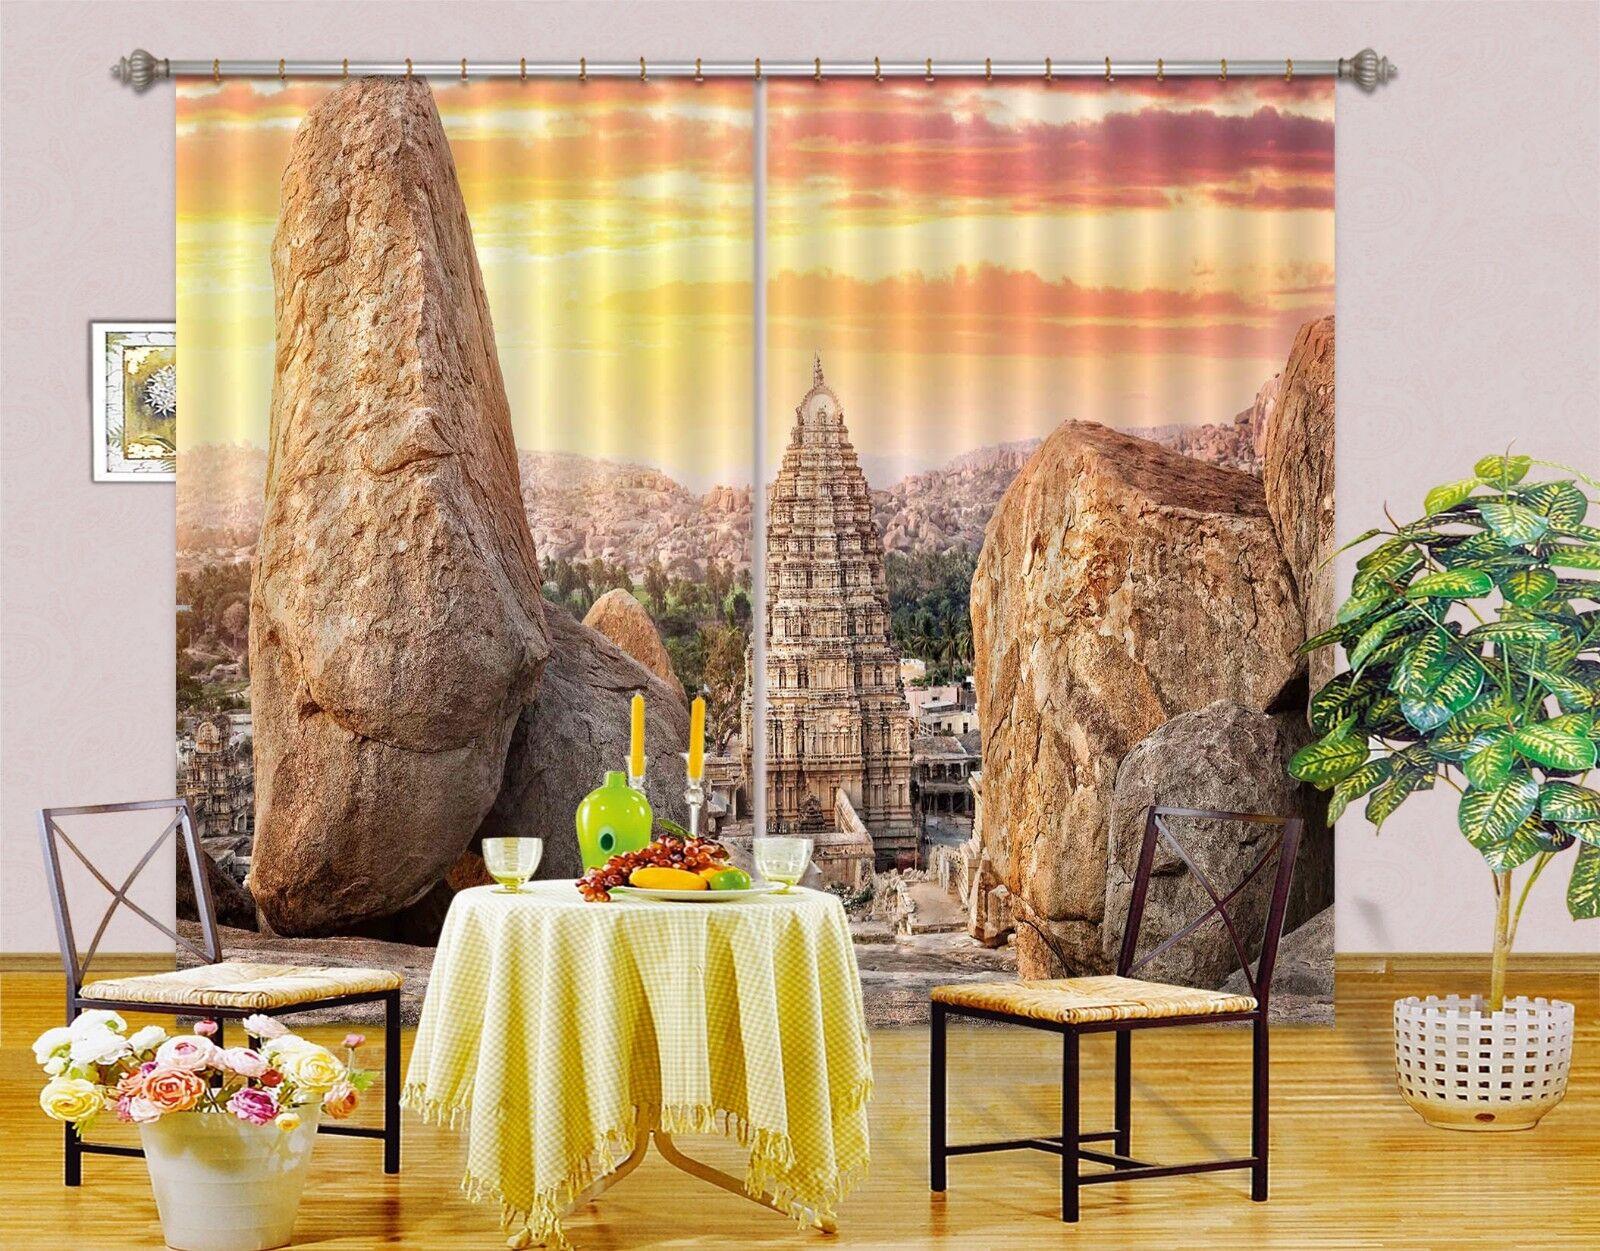 3D torre Sky 81 Cortinas de impresión de cortina de foto Blockout Tela Cortinas Ventana CA